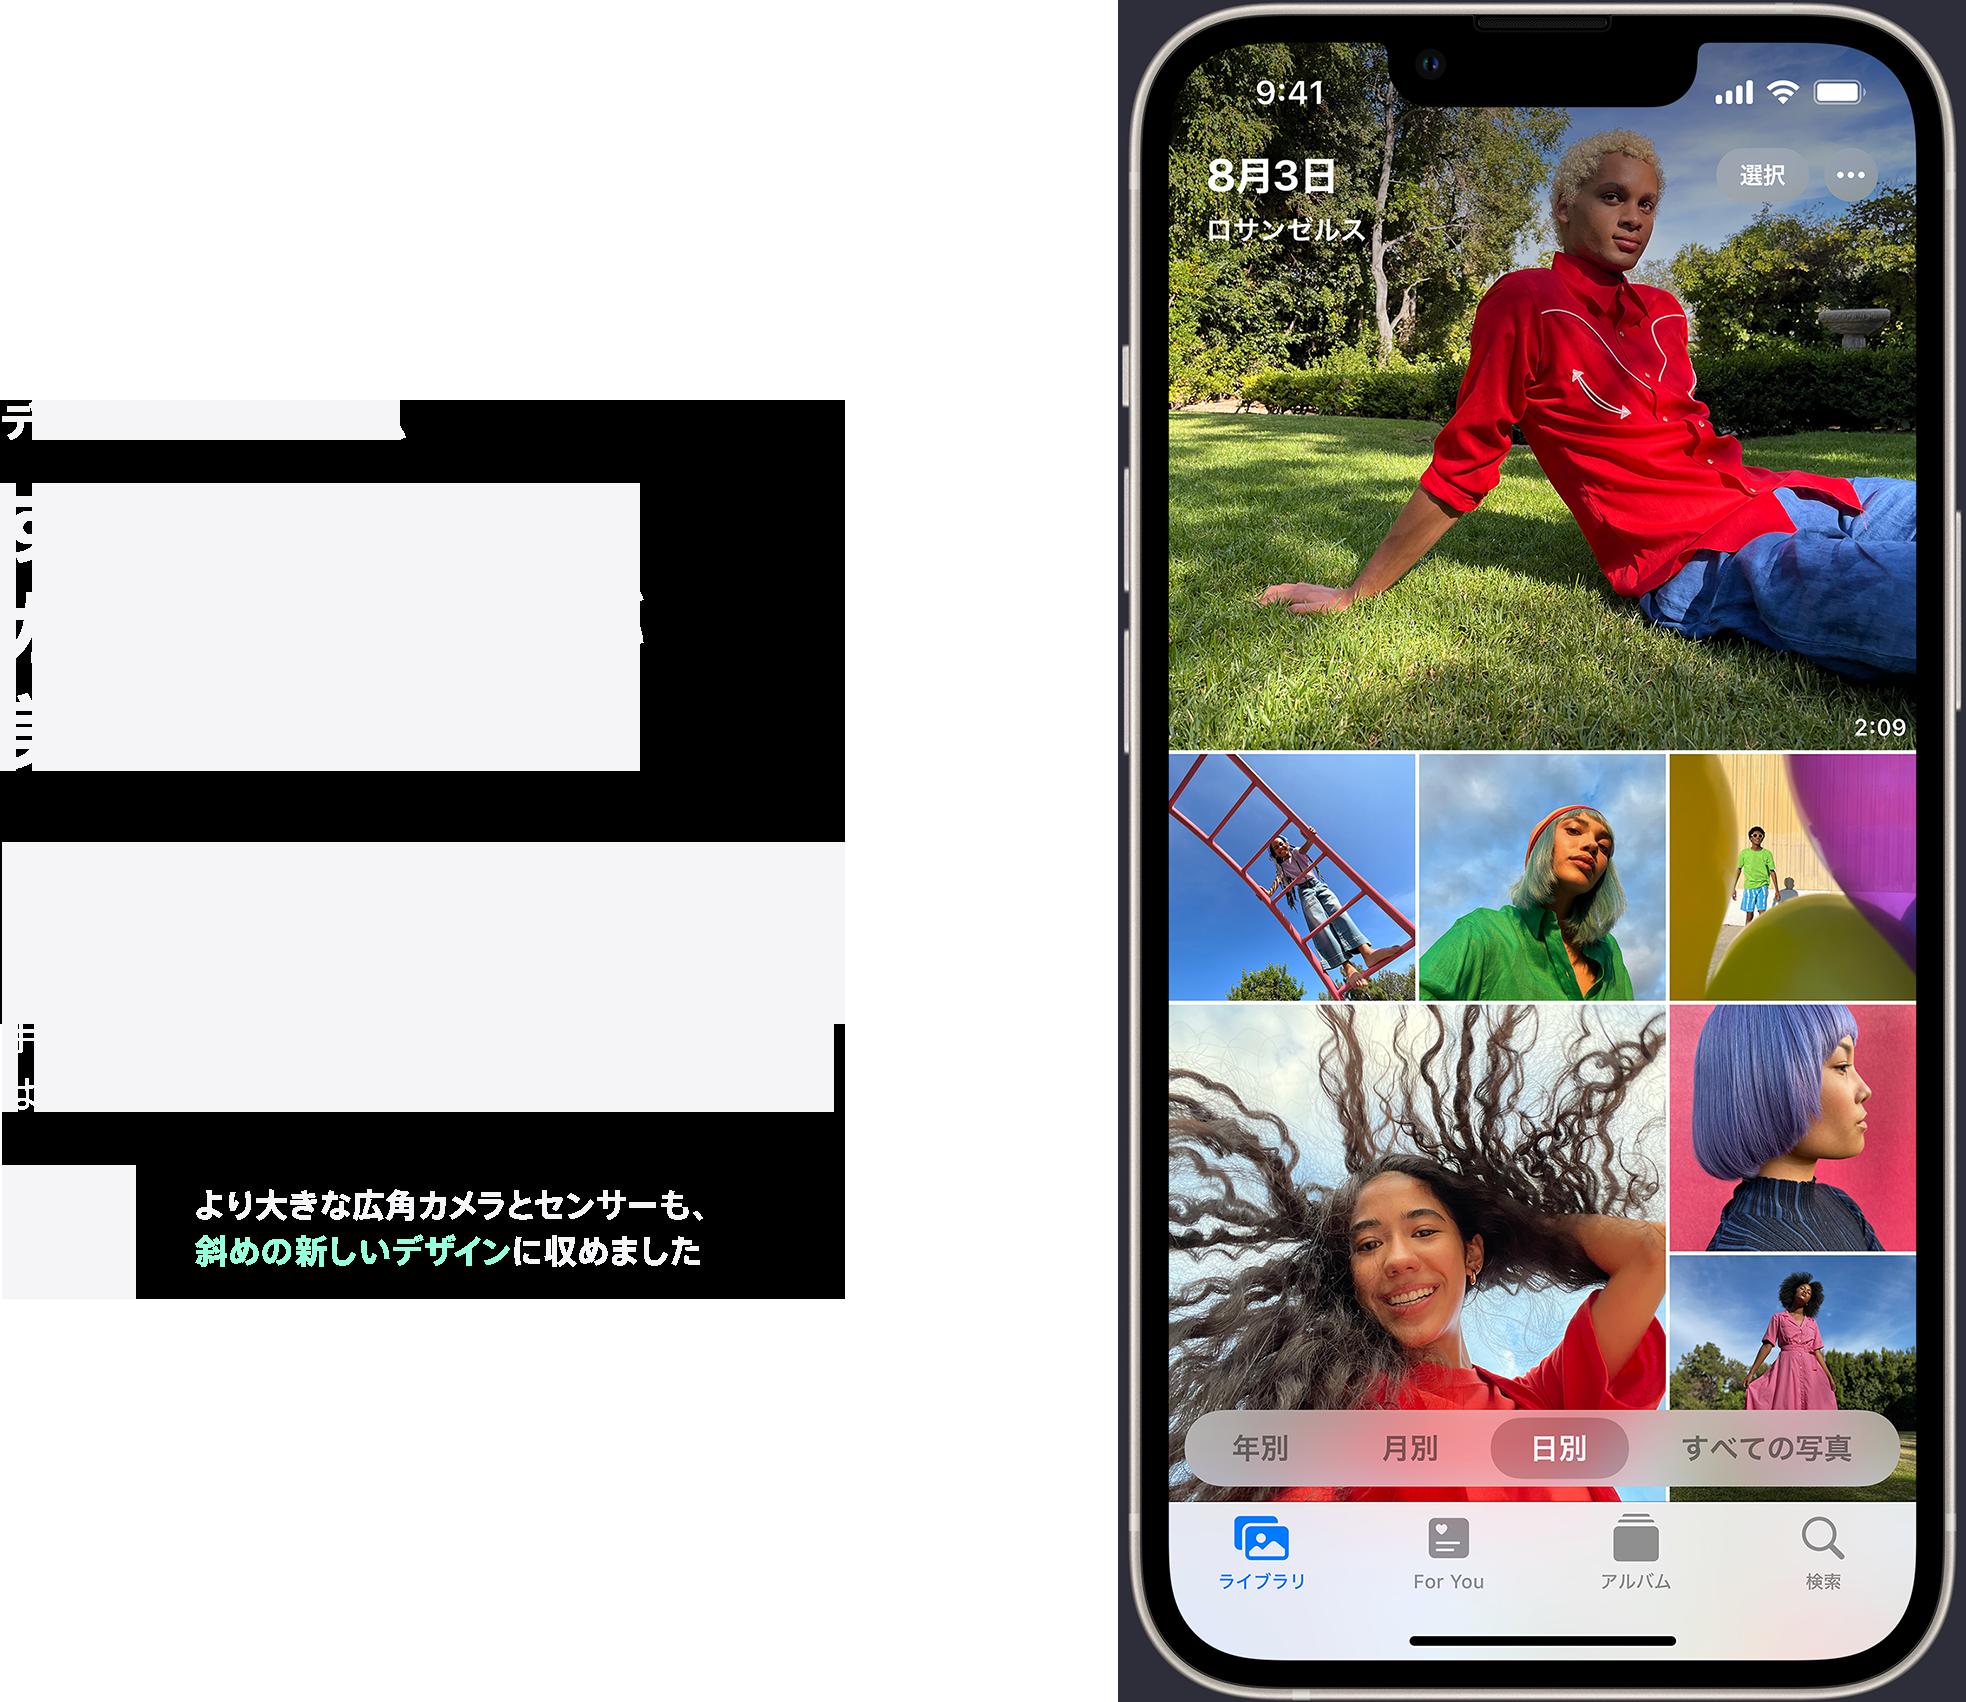 iphone13 デュアルカメラシステム